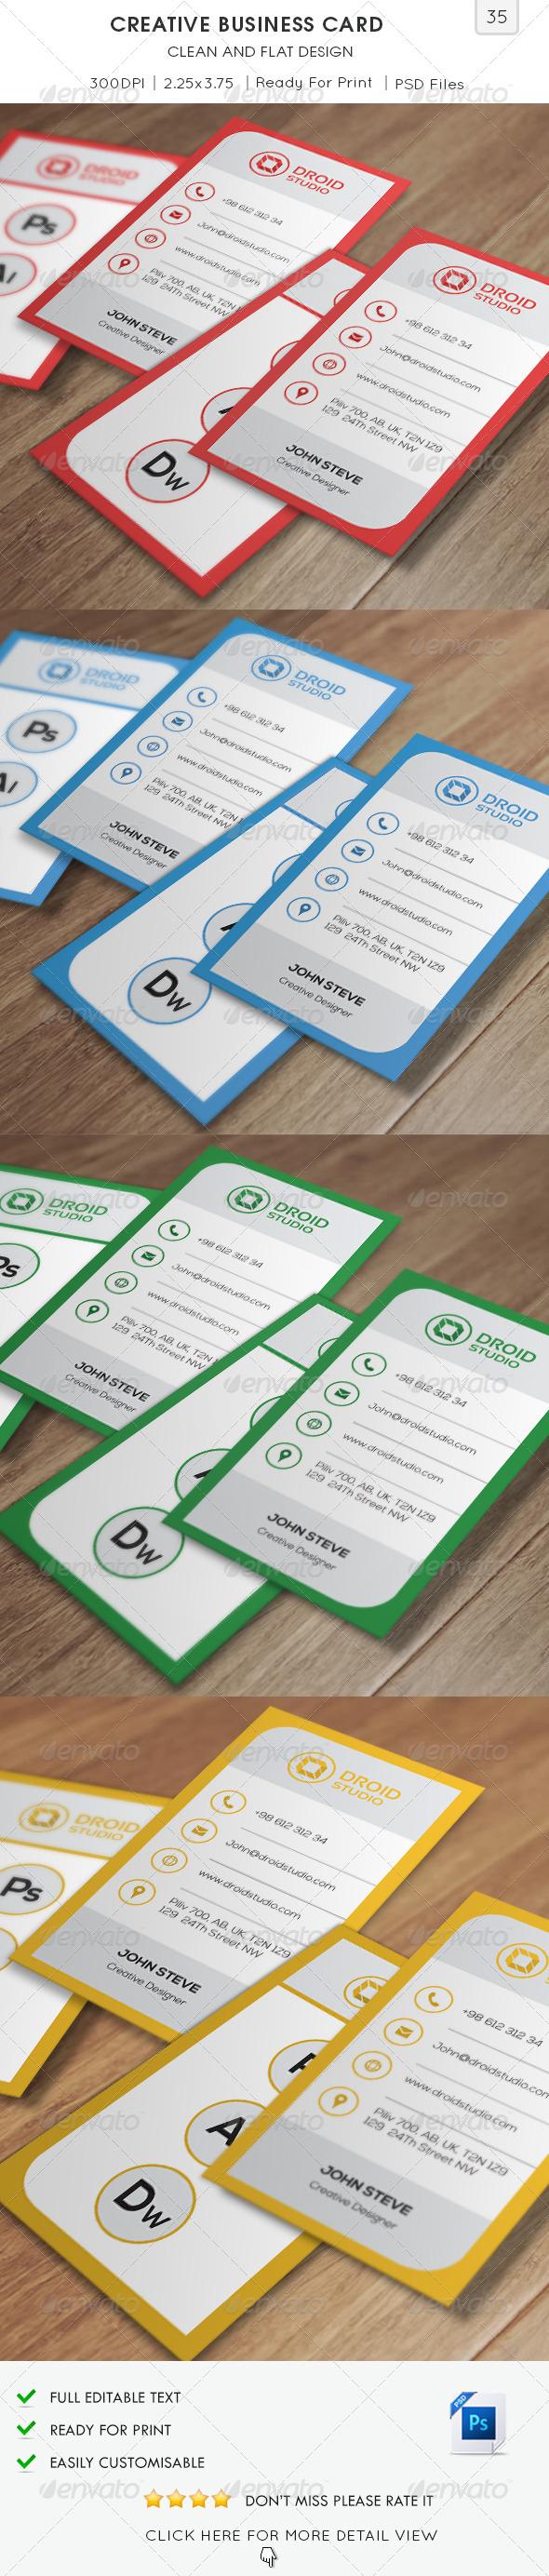 Creative Flat Business Card v35 - Creative Business Cards